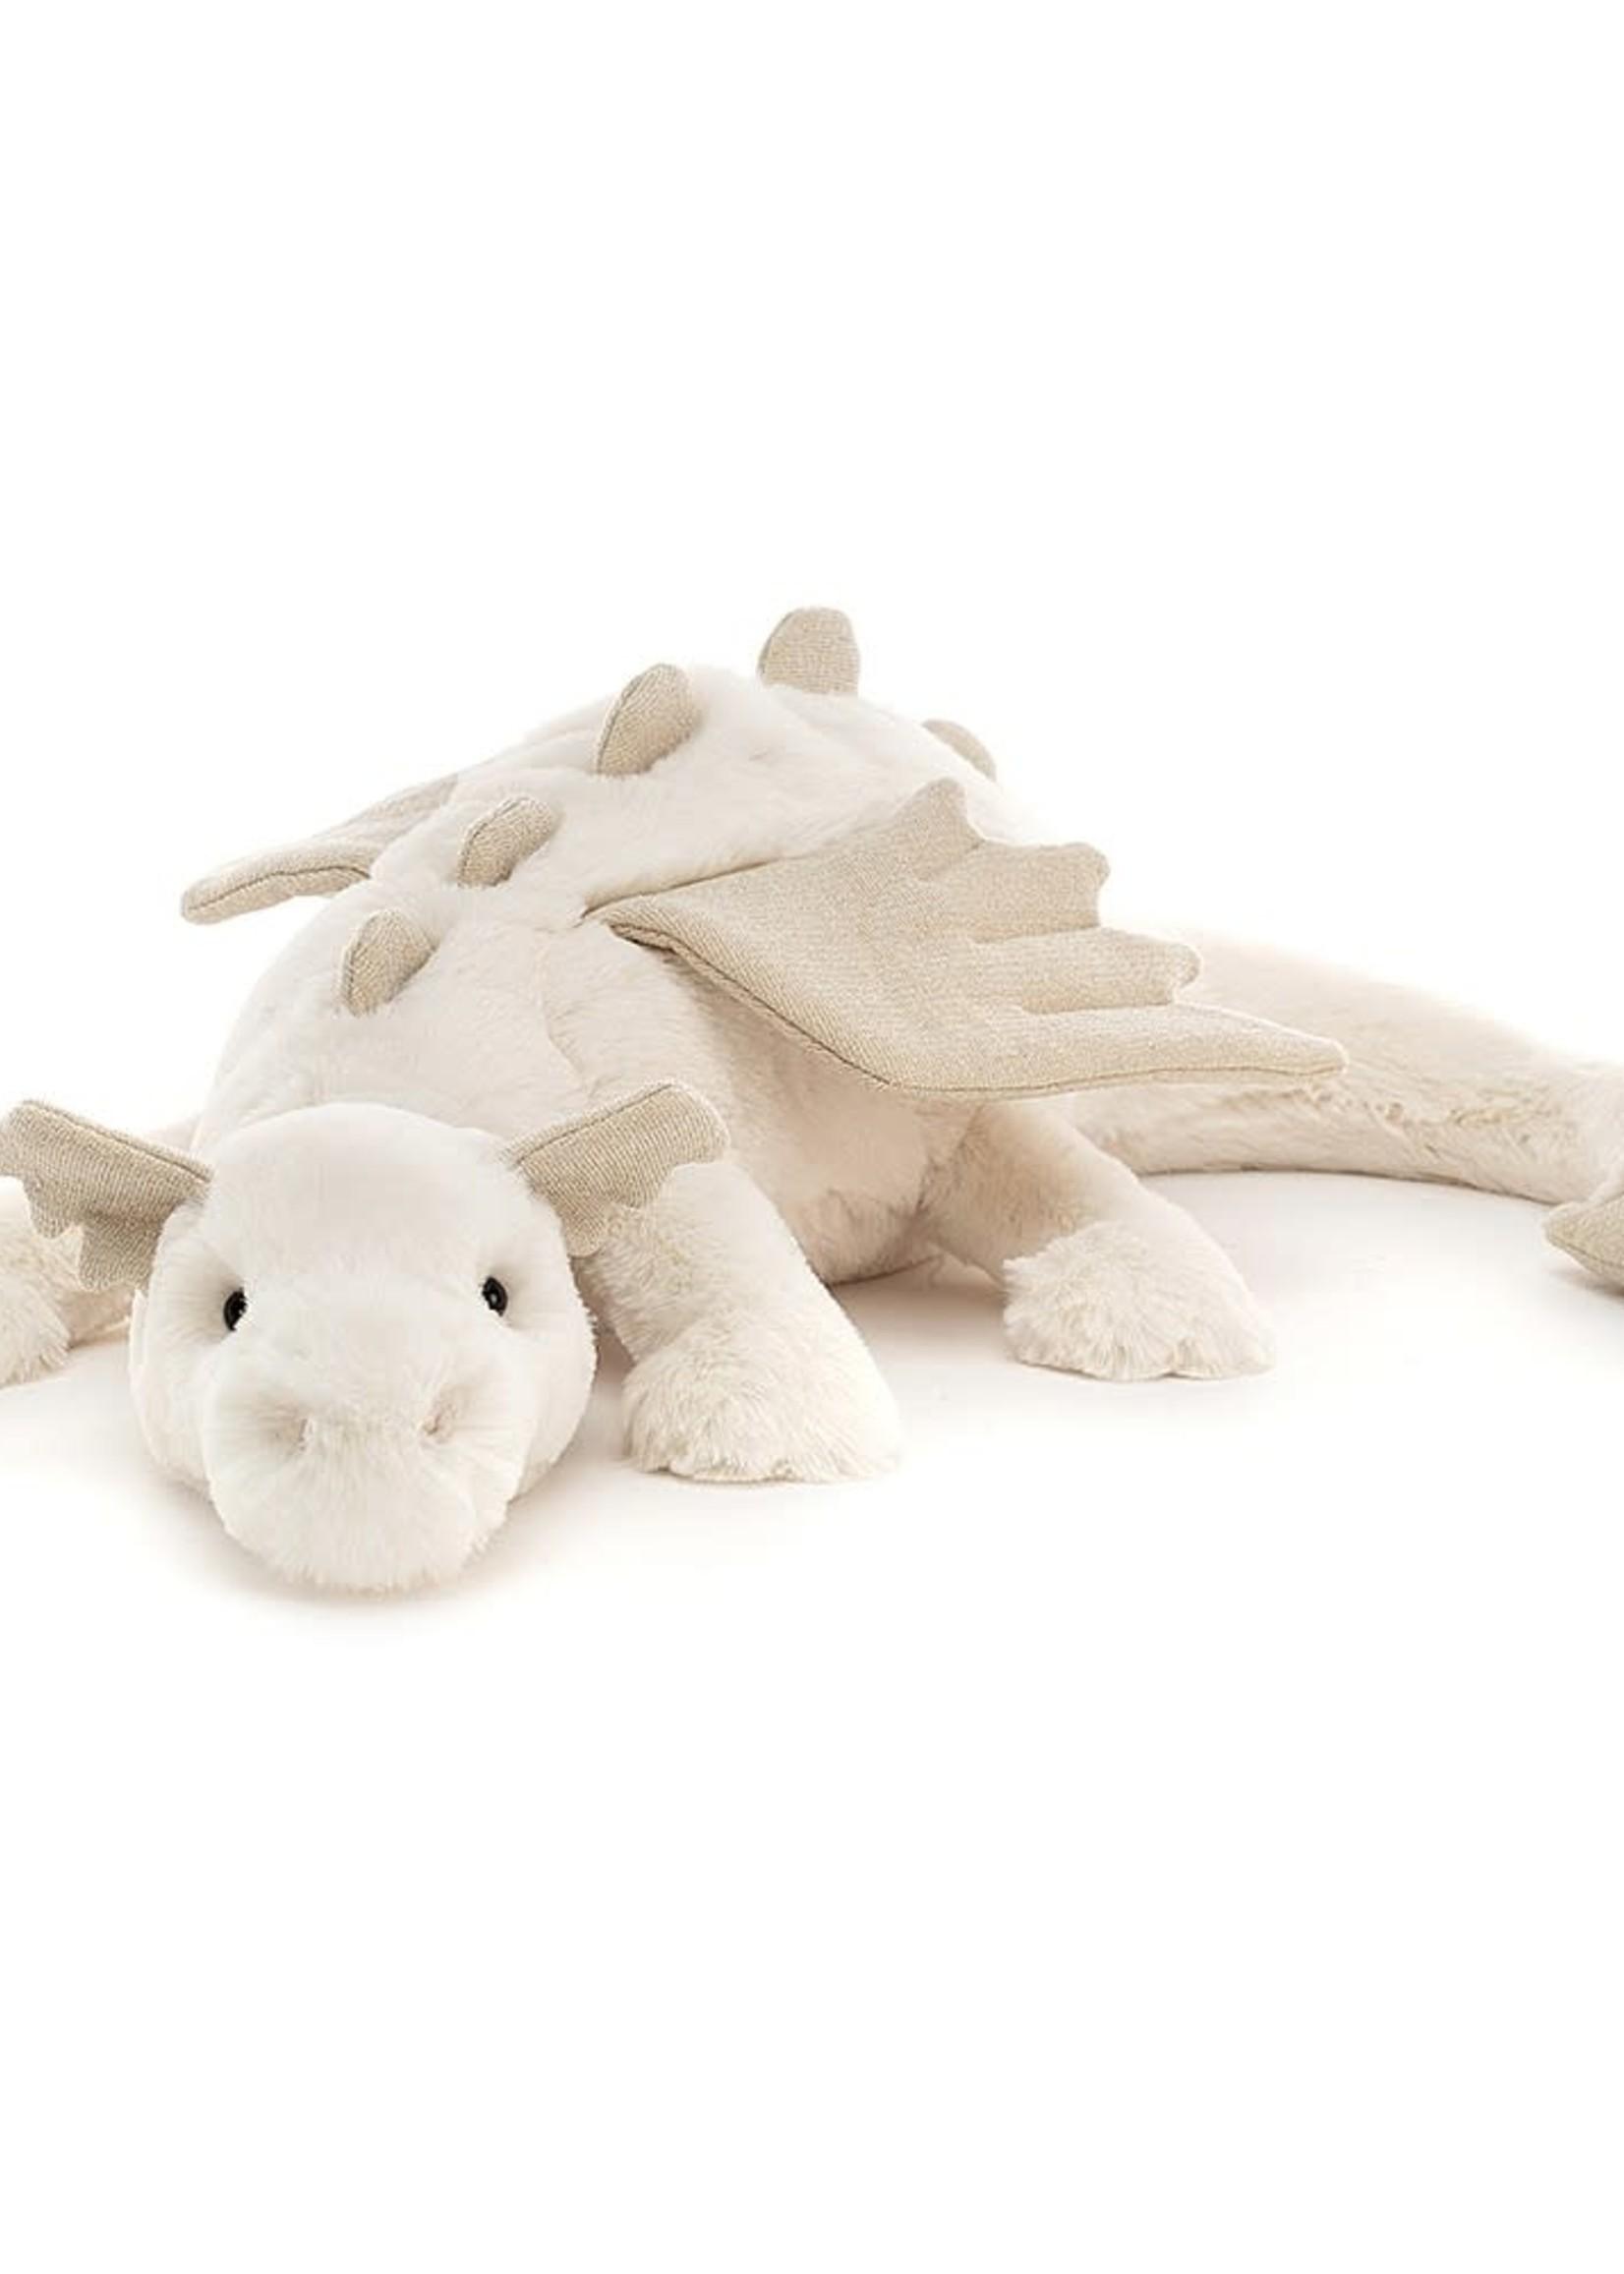 Jellycat JC Medium Snow Dragon